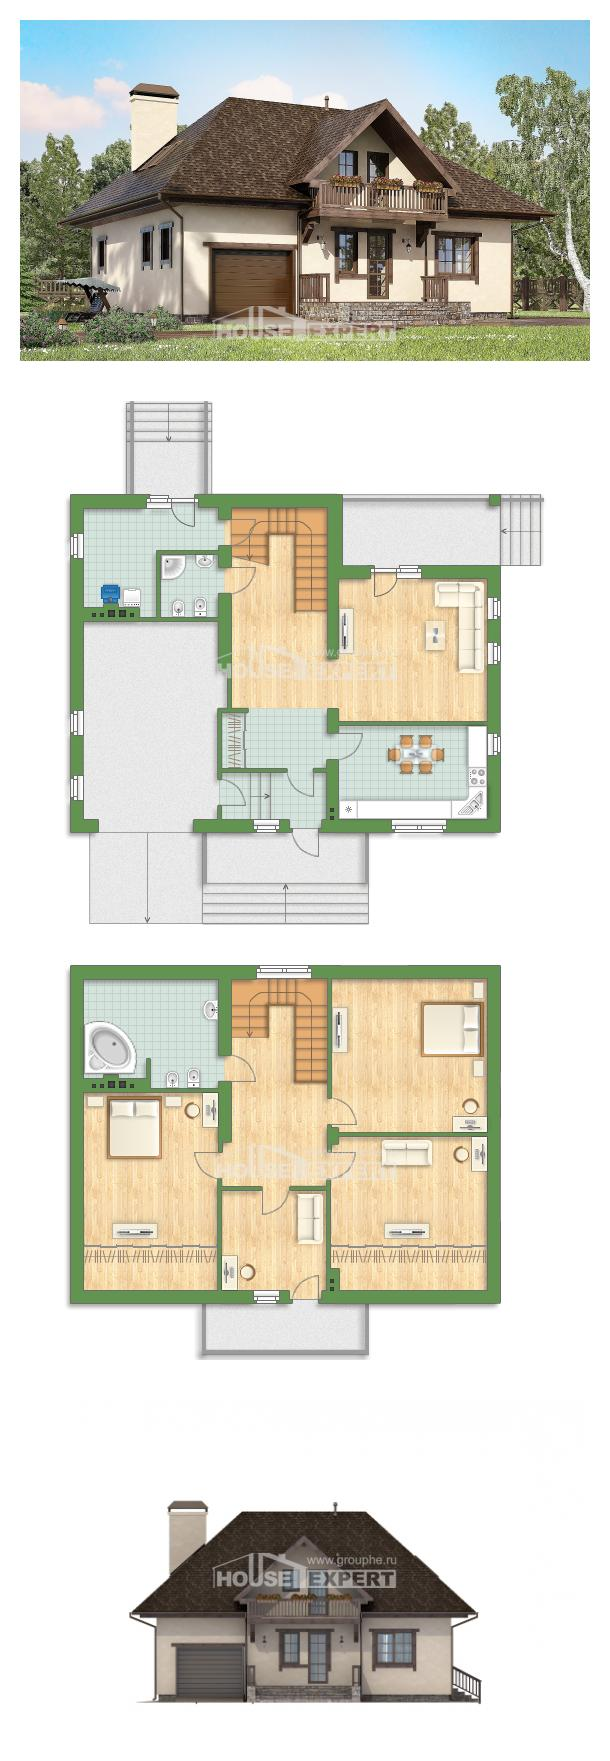 Проект дома 200-001-Л   House Expert